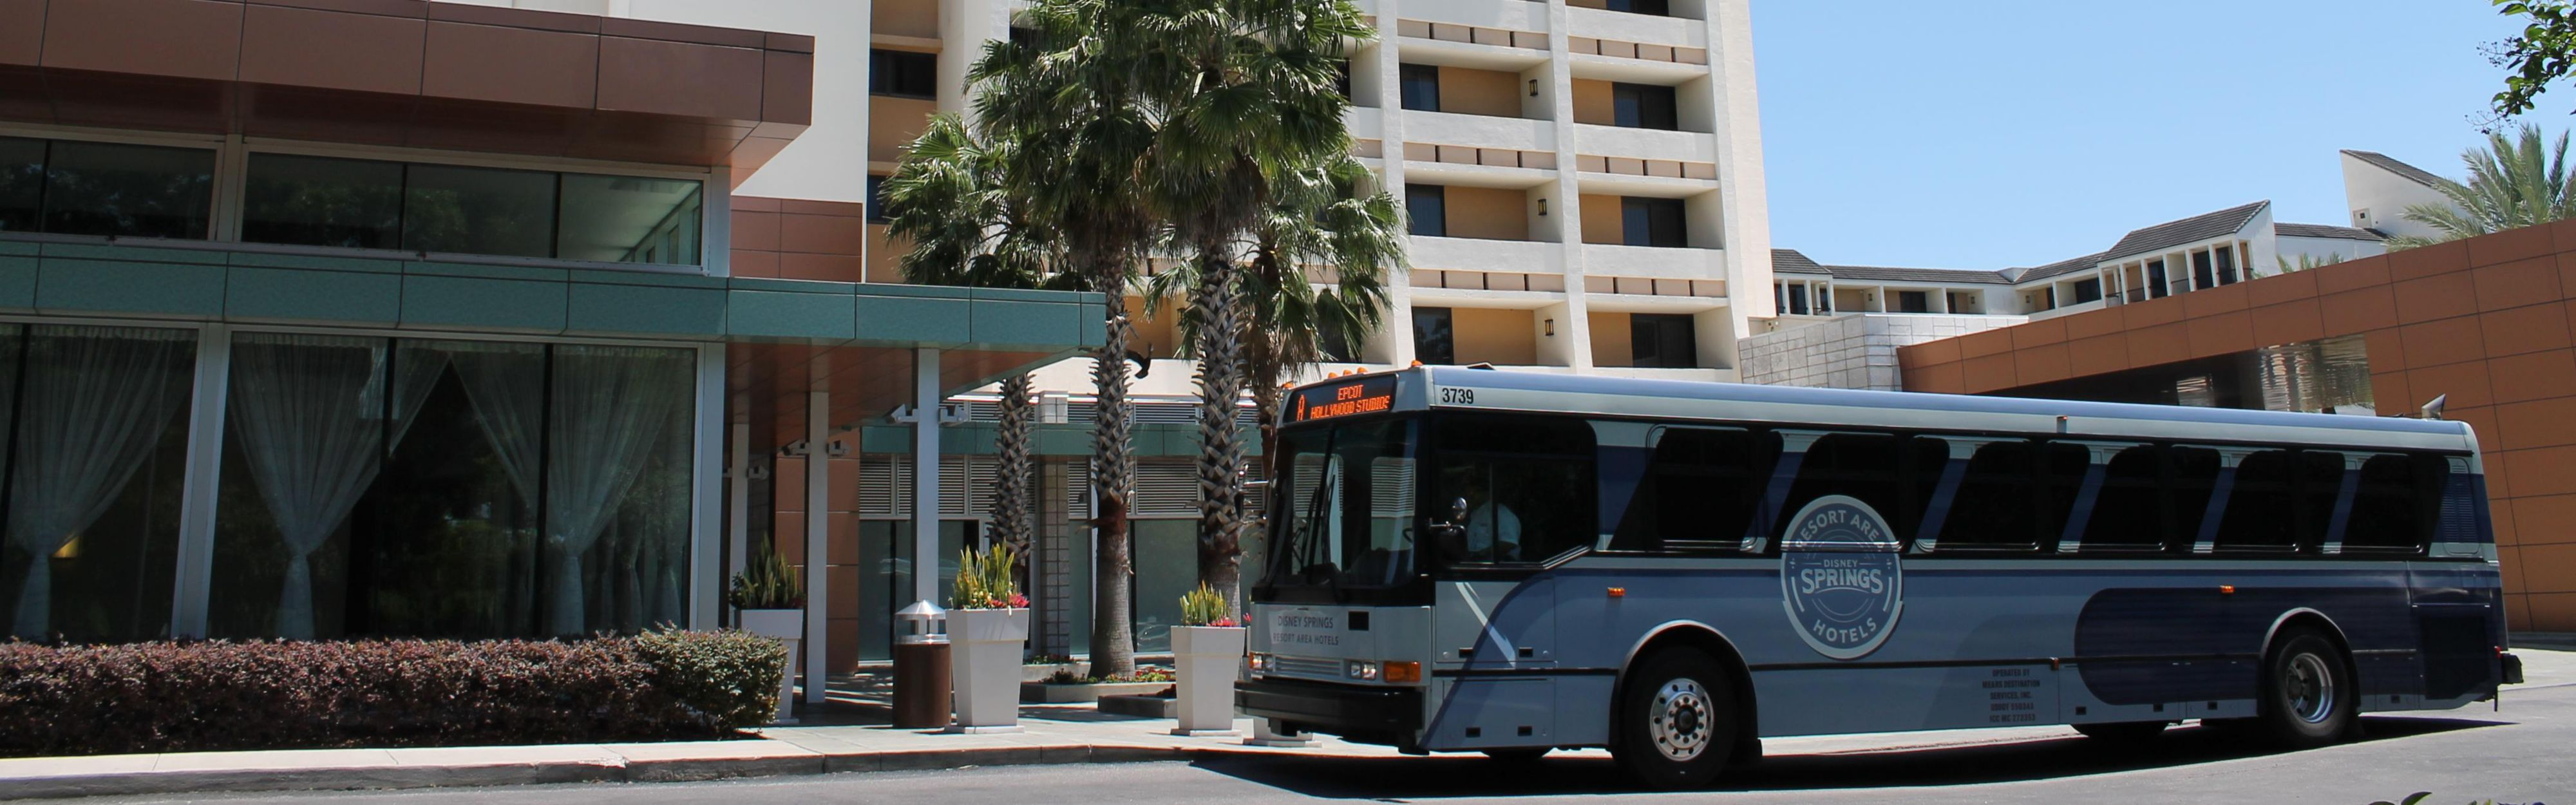 Hotels On Hotel Plaza Boulevard Lake Buena Vista Fl